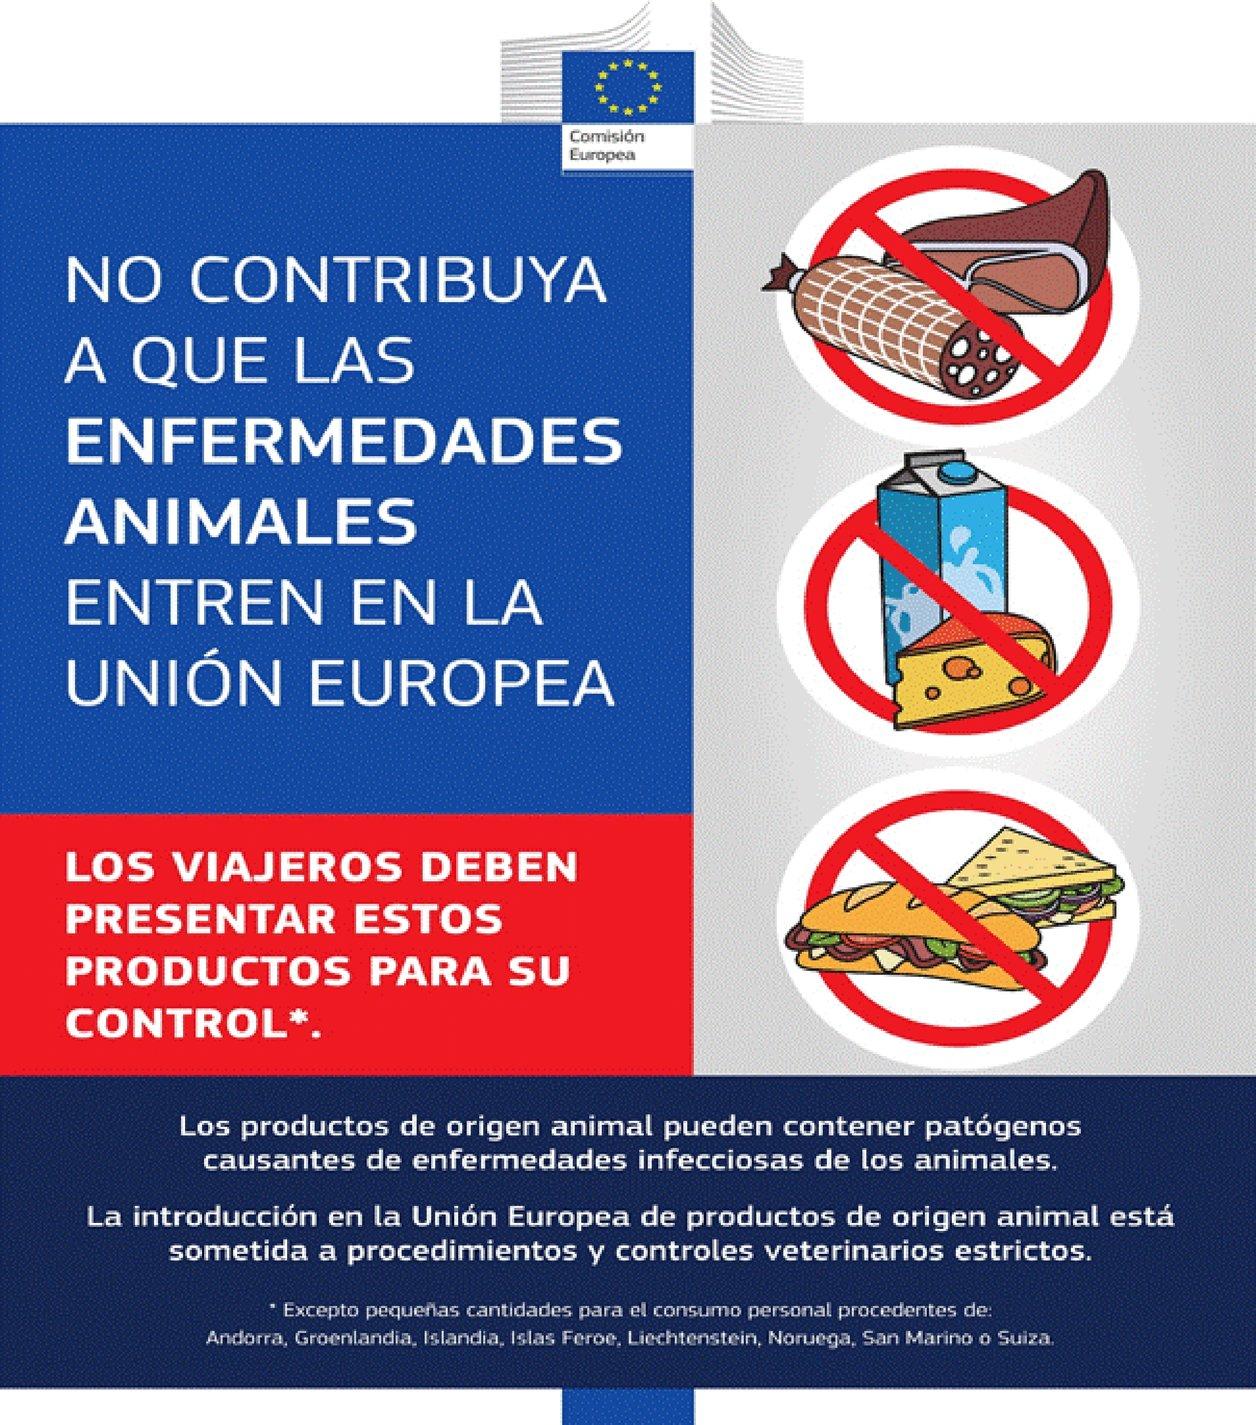 Imagen: https://eur-lex.europa.eu/resource.html?uri=uriserv:OJ.L_.2019.321.01.0045.01.SPA.xhtml.L_2019321ES.01005801.tif.jpg